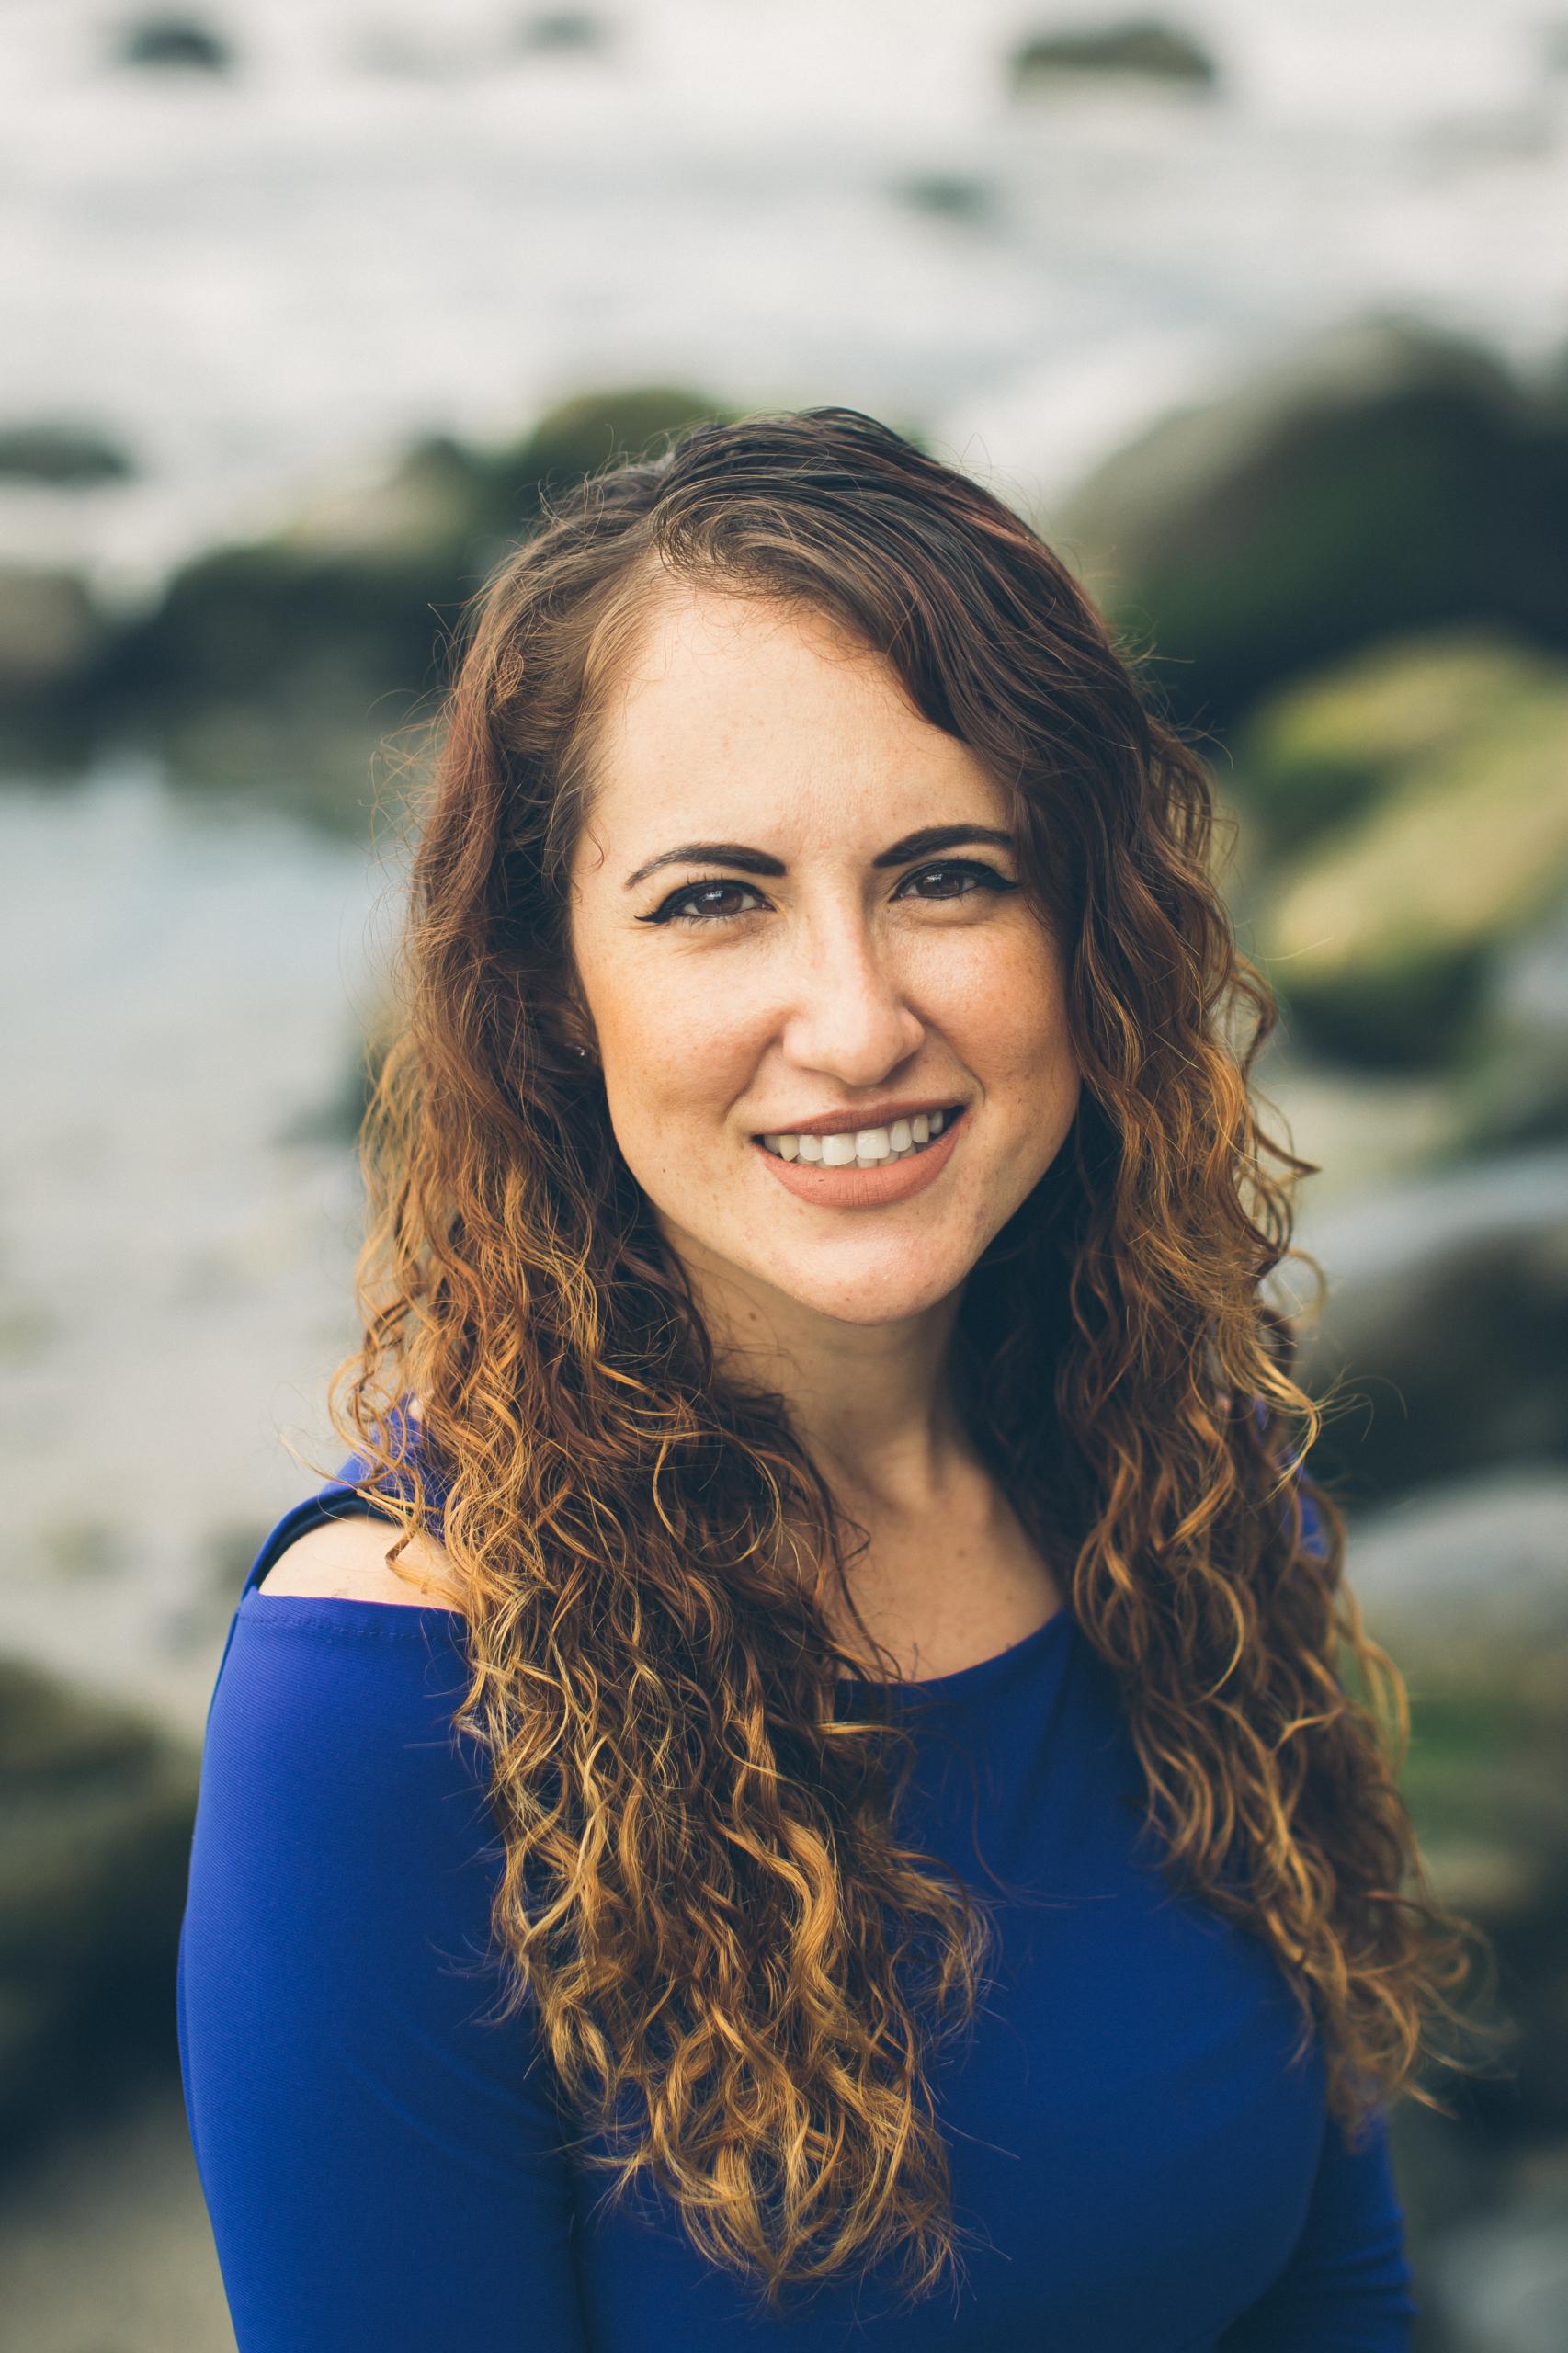 Meet Karina, Case Manager at Surrogate Parenting Services